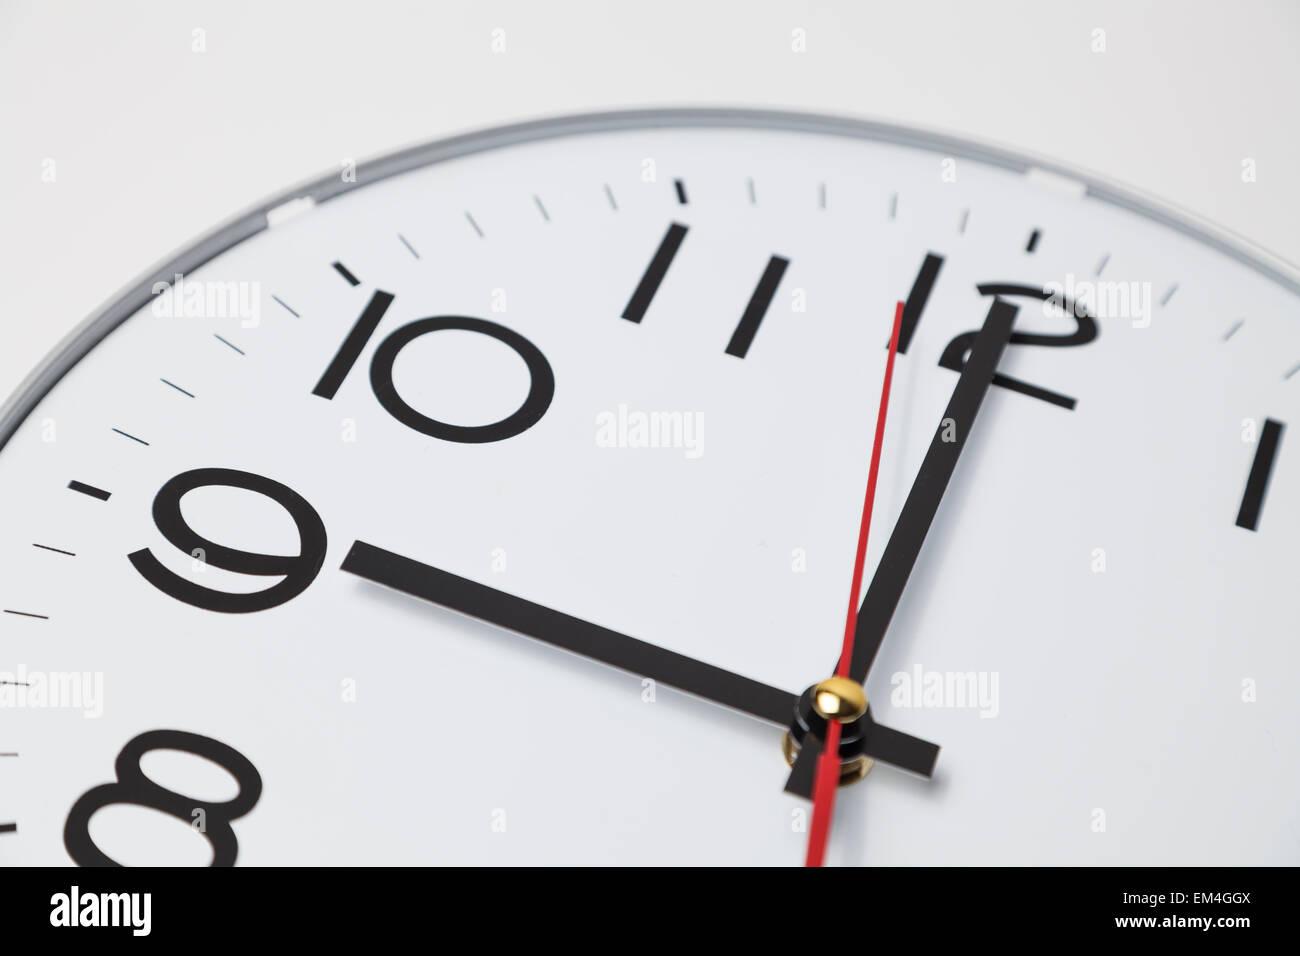 9 o'clock - Stock Image